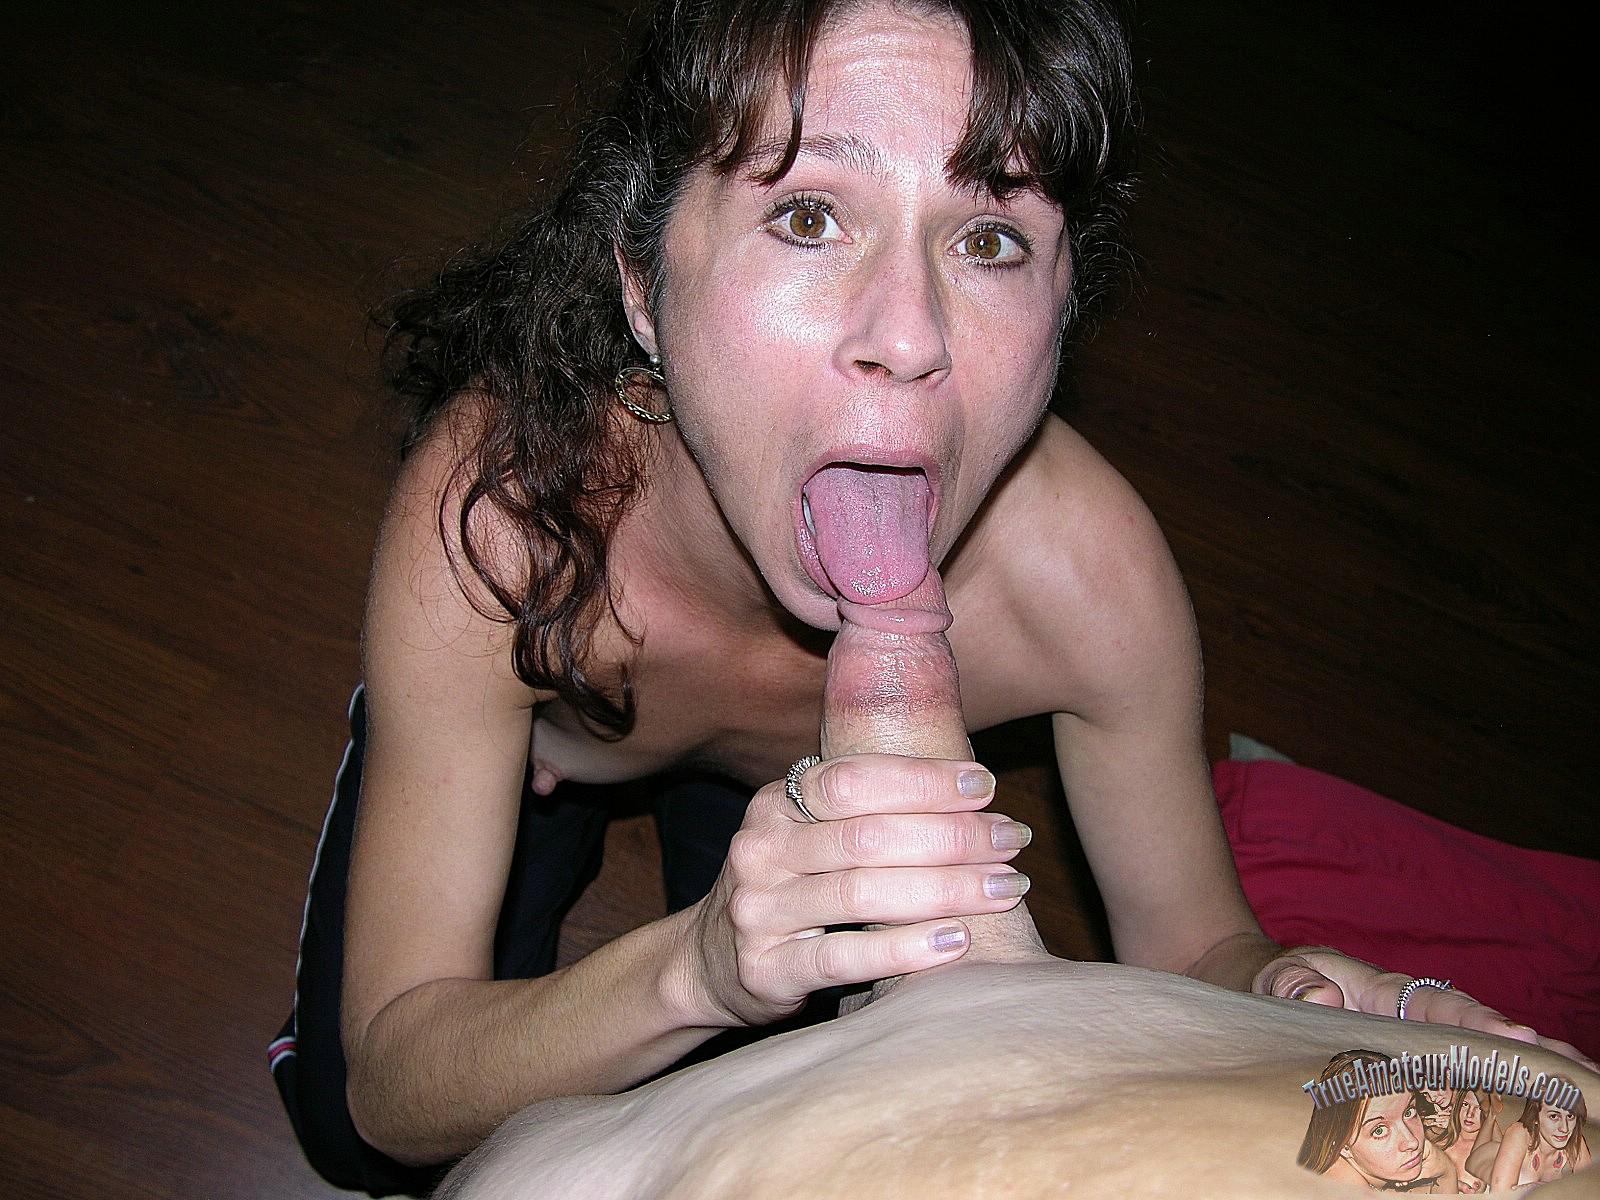 sloppy-blowjob-porn